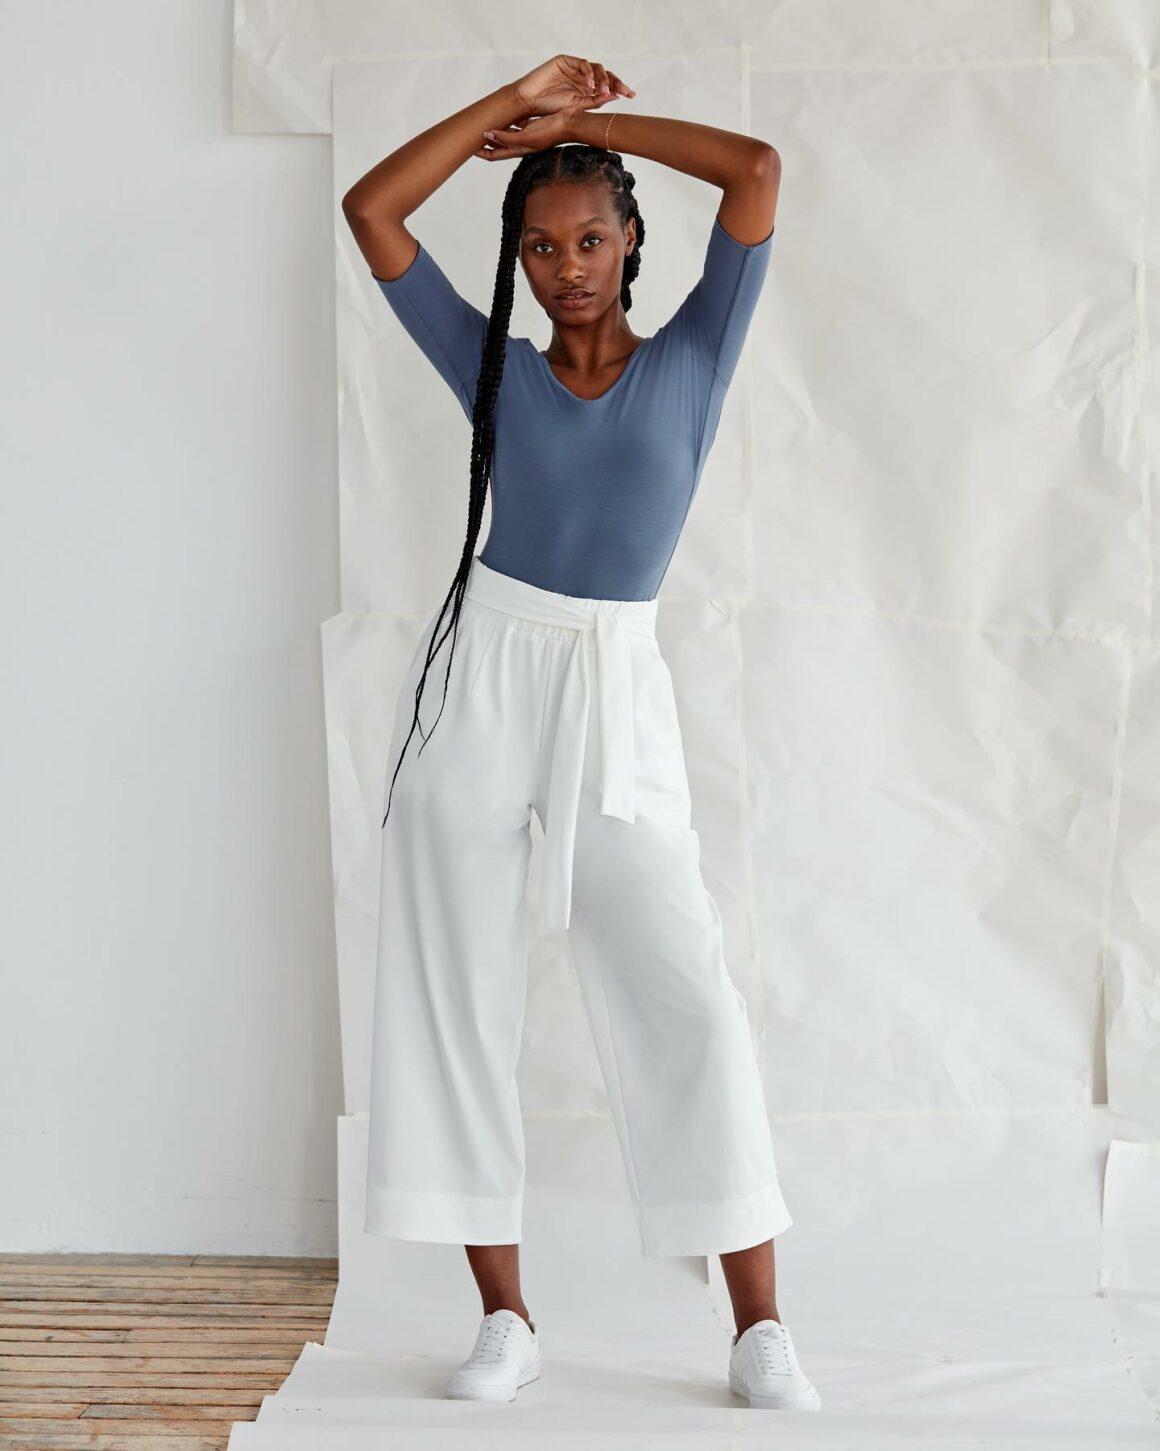 Best Affordable Minimalist Fashion Brands - ADay